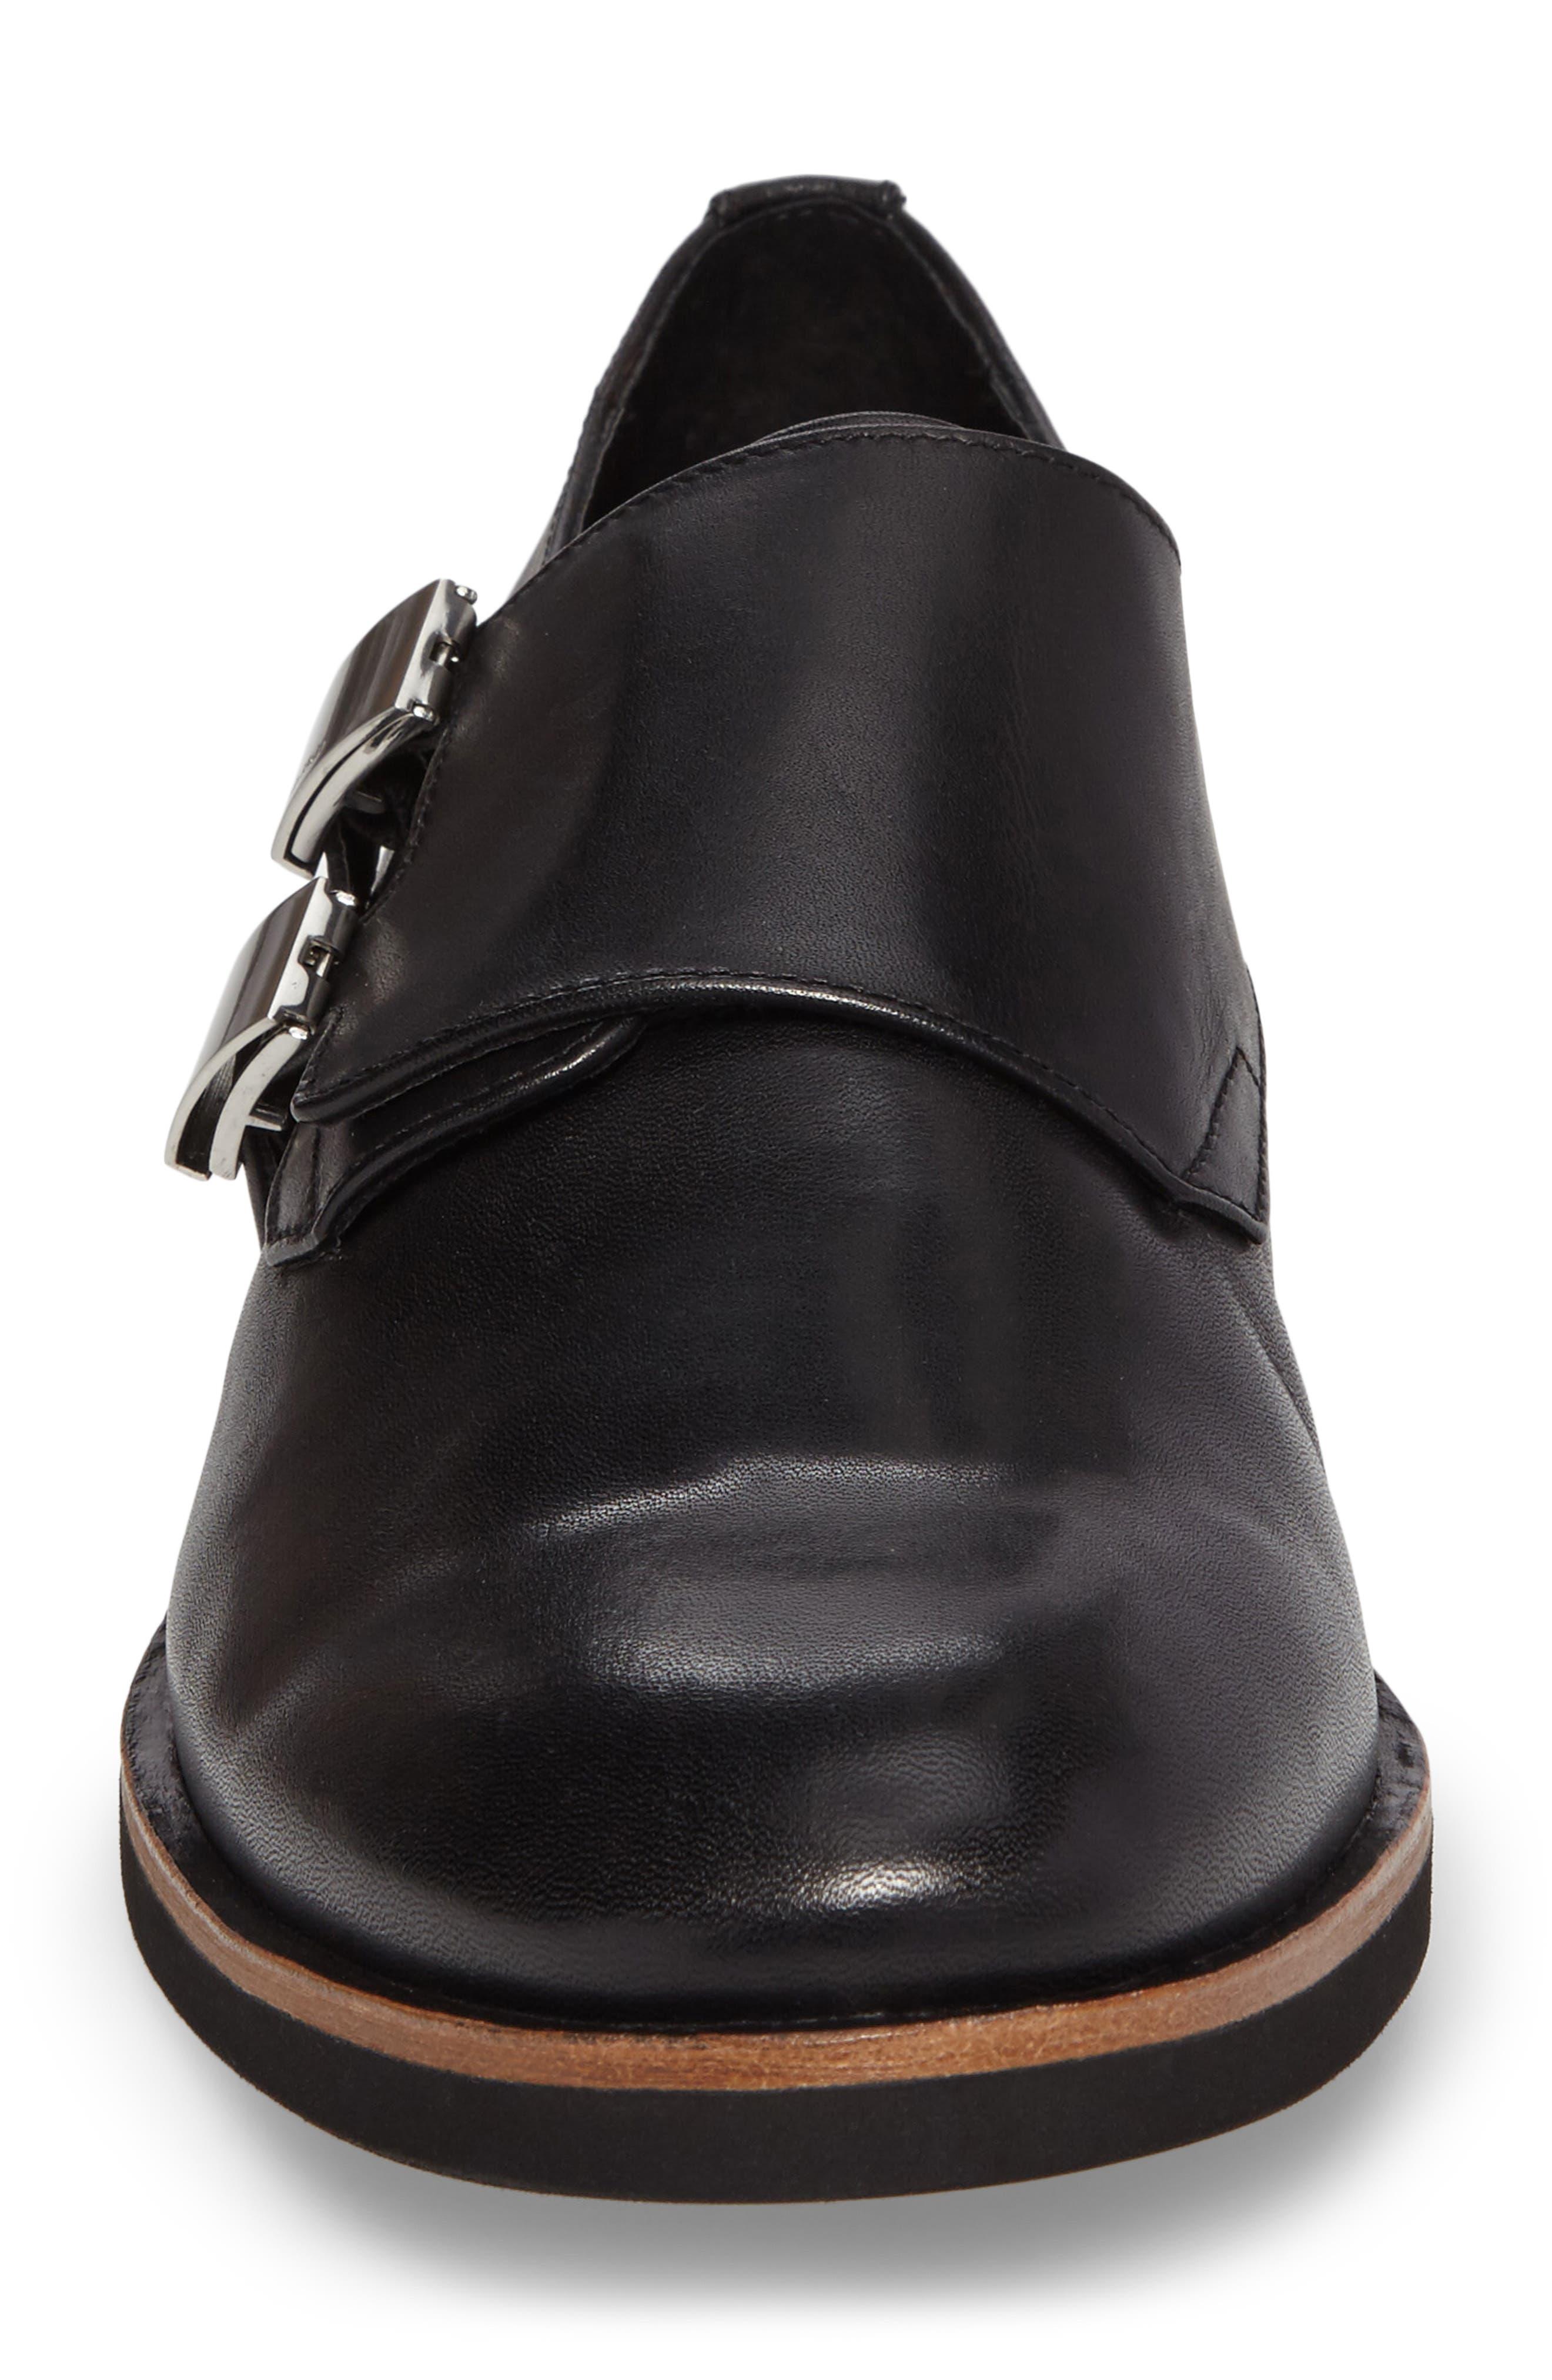 Finnegan Double Monk Strap Shoe,                             Alternate thumbnail 4, color,                             Black Leather